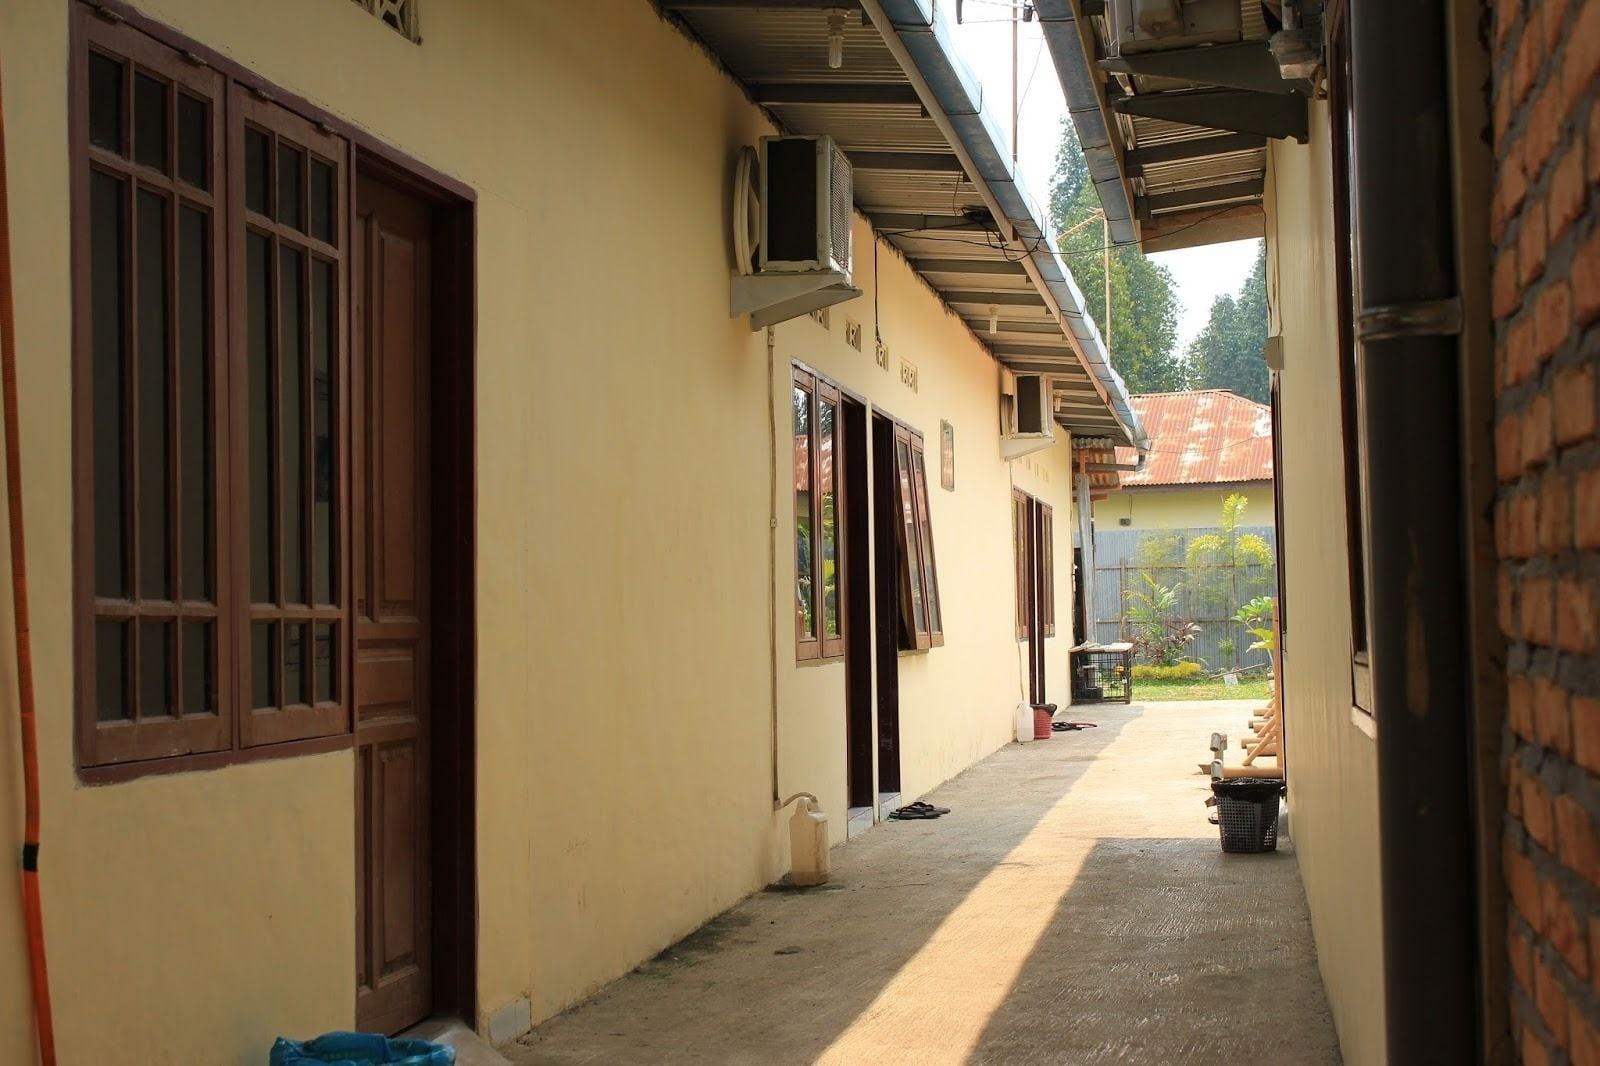 Amelia Guest House Tanjung Morawa, Deli Serdang